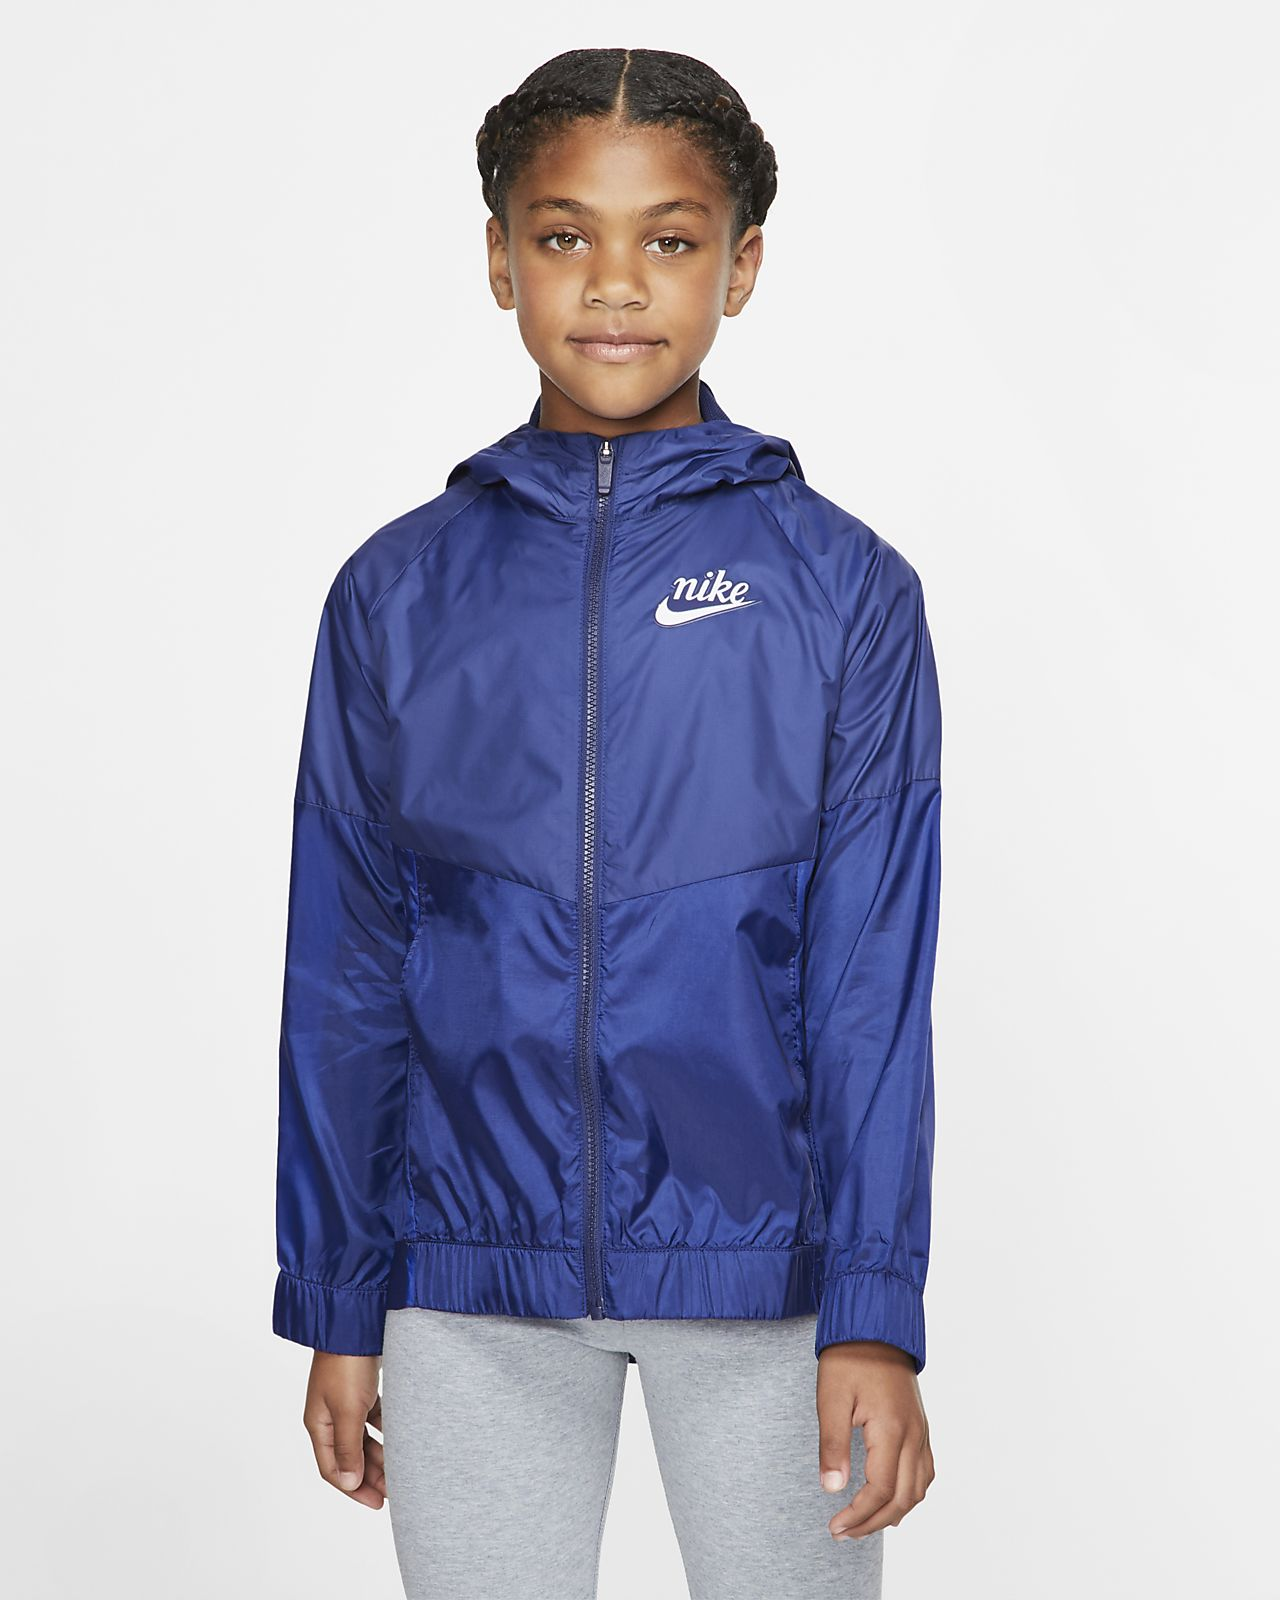 096fcc67 Nike Sportswear Windrunner Big Kids' Jacket. Nike.com